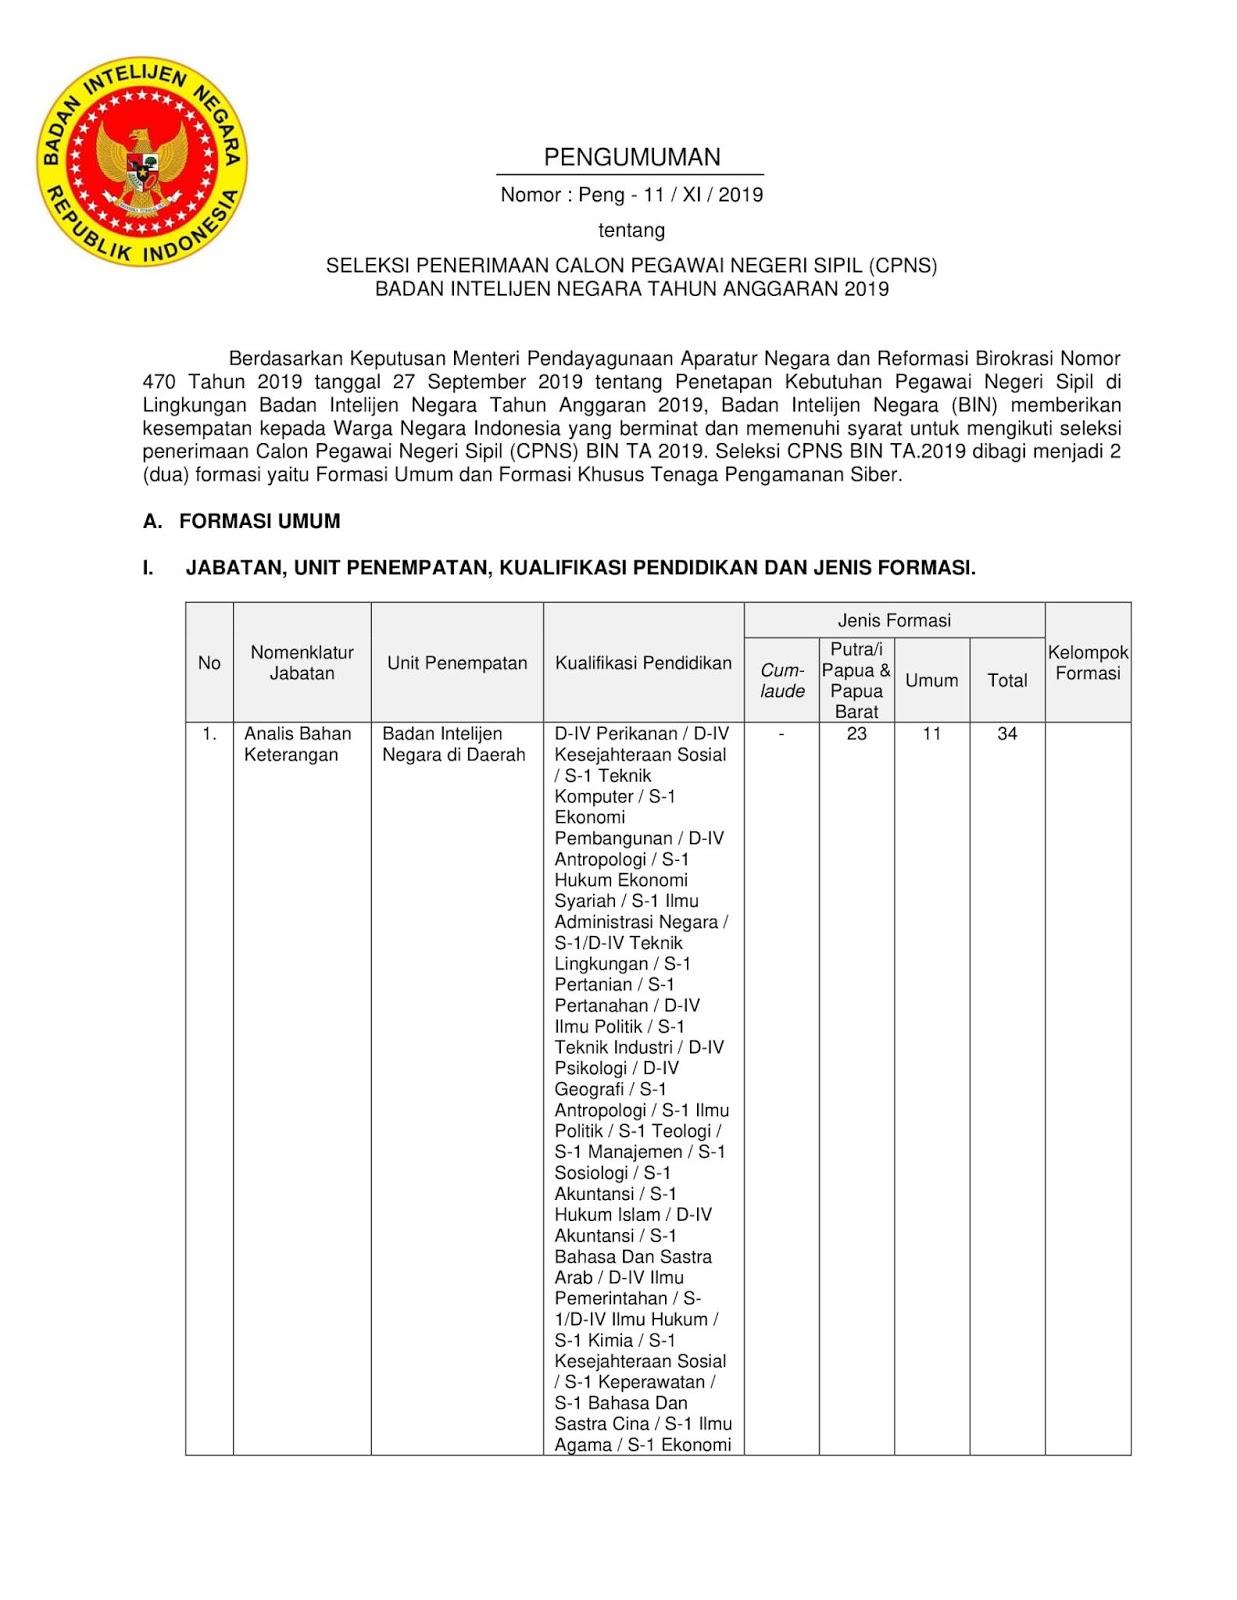 Cpns Bin 2019 : Lowongan, Kerja, Badan, Intelijen, Negara, Tahun, Anggaran, Formasi], REKRUTMEN, LOWONGAN, KERJA, BULAN, MARET